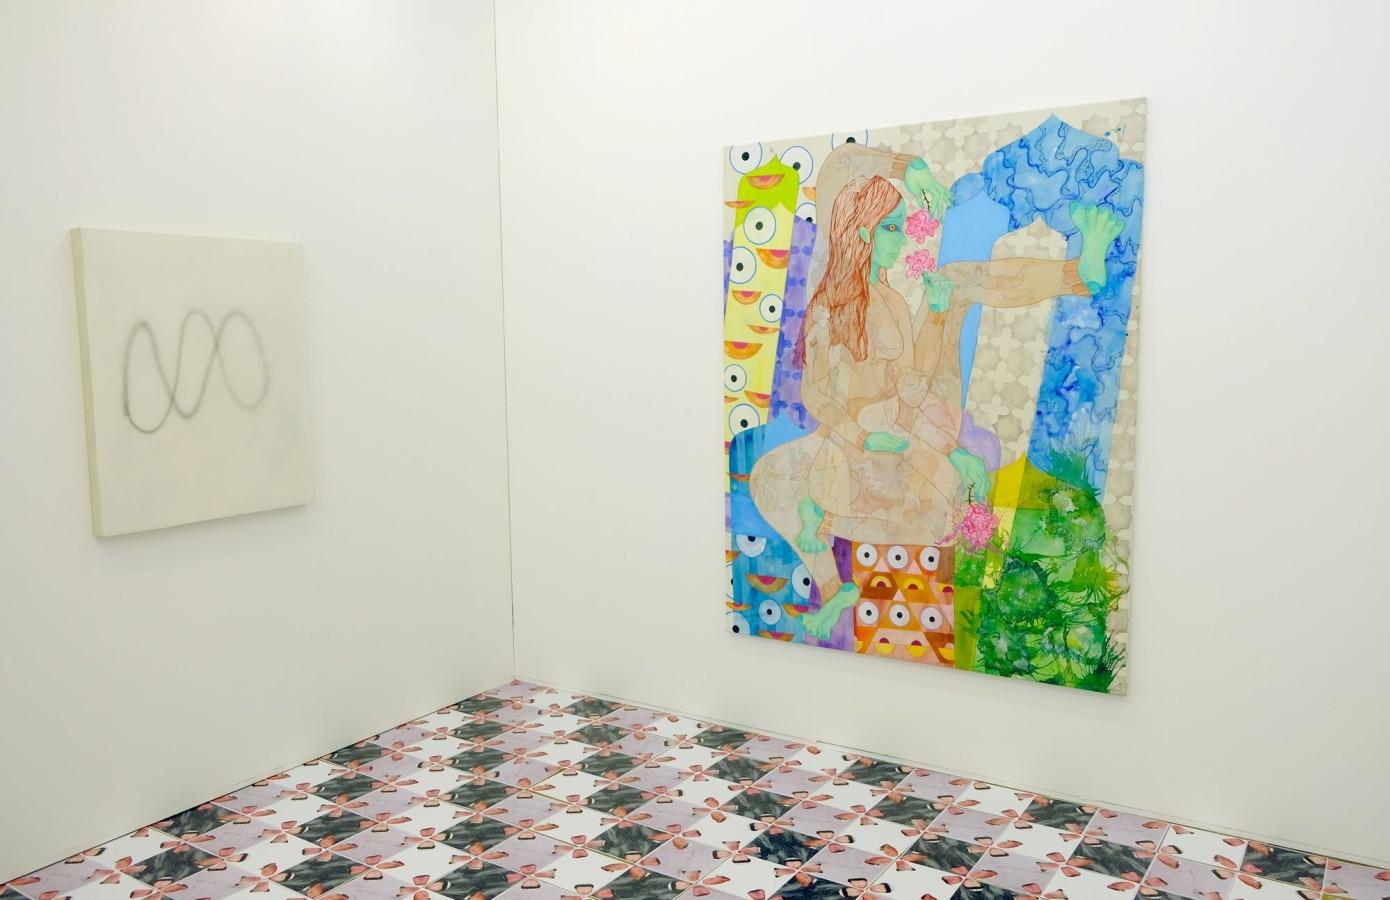 Art Rotterdam 2019, Sophie Reinhold,